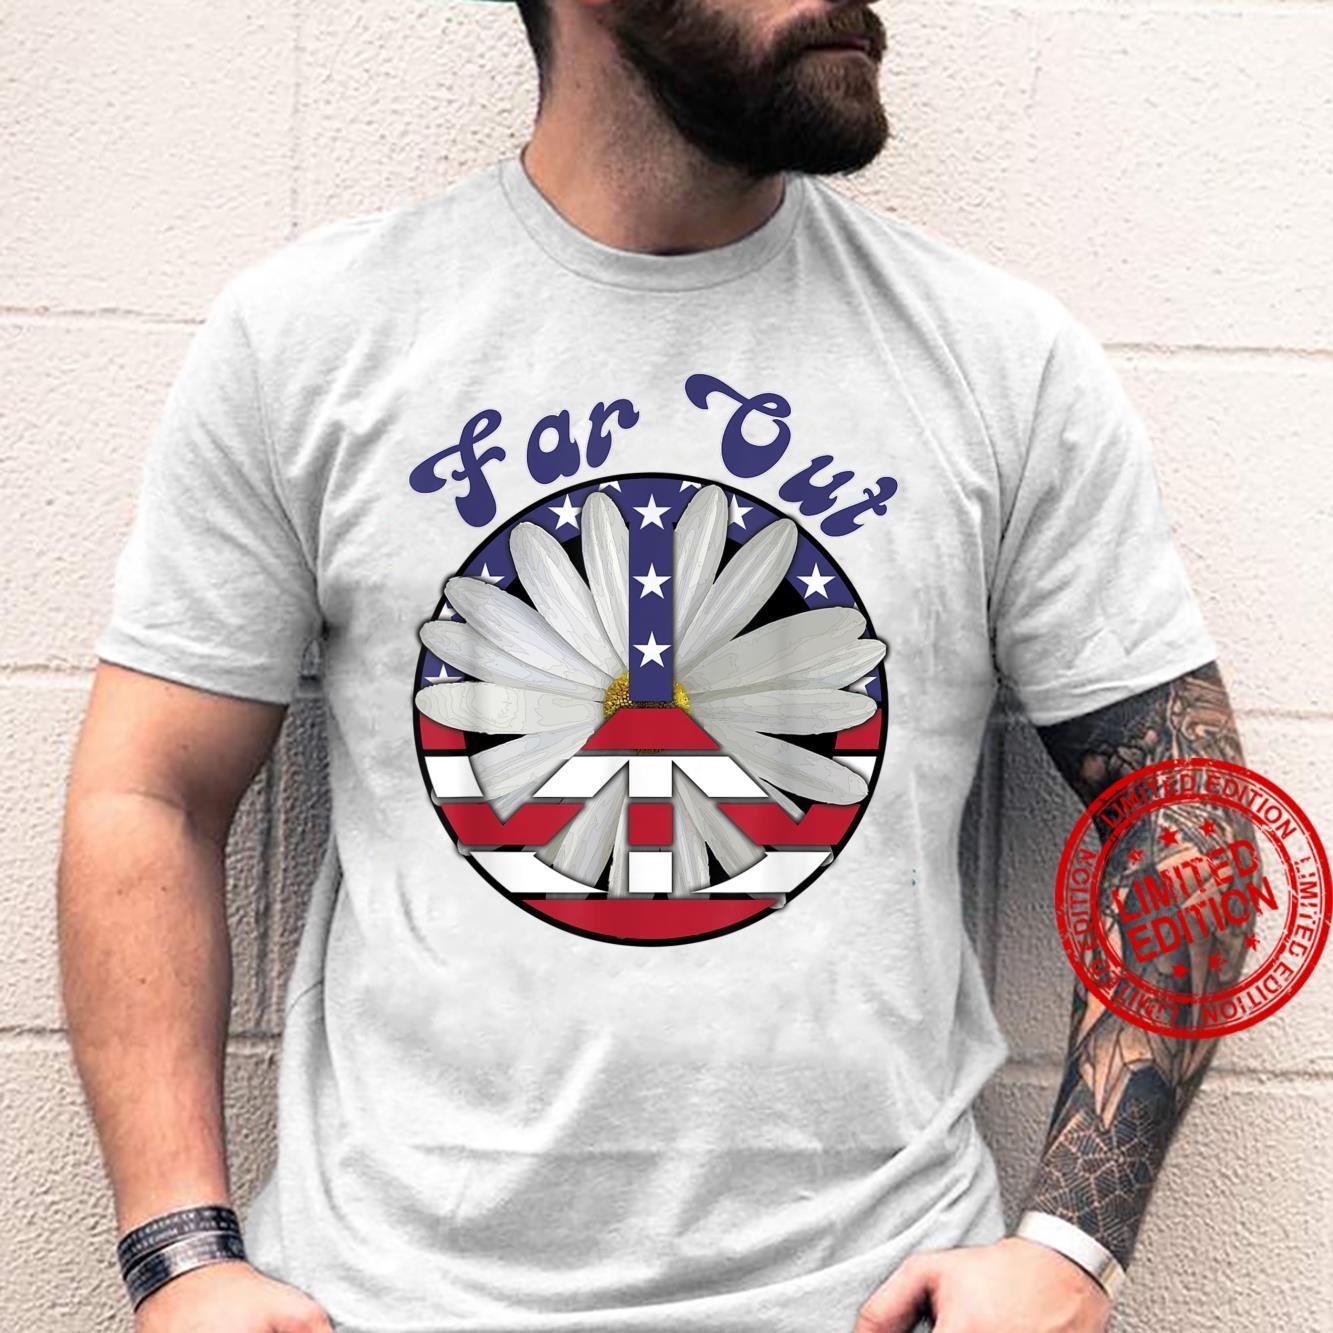 Far Out Peace Sign With Daisy 60s 70s Hippie Boho Shirt